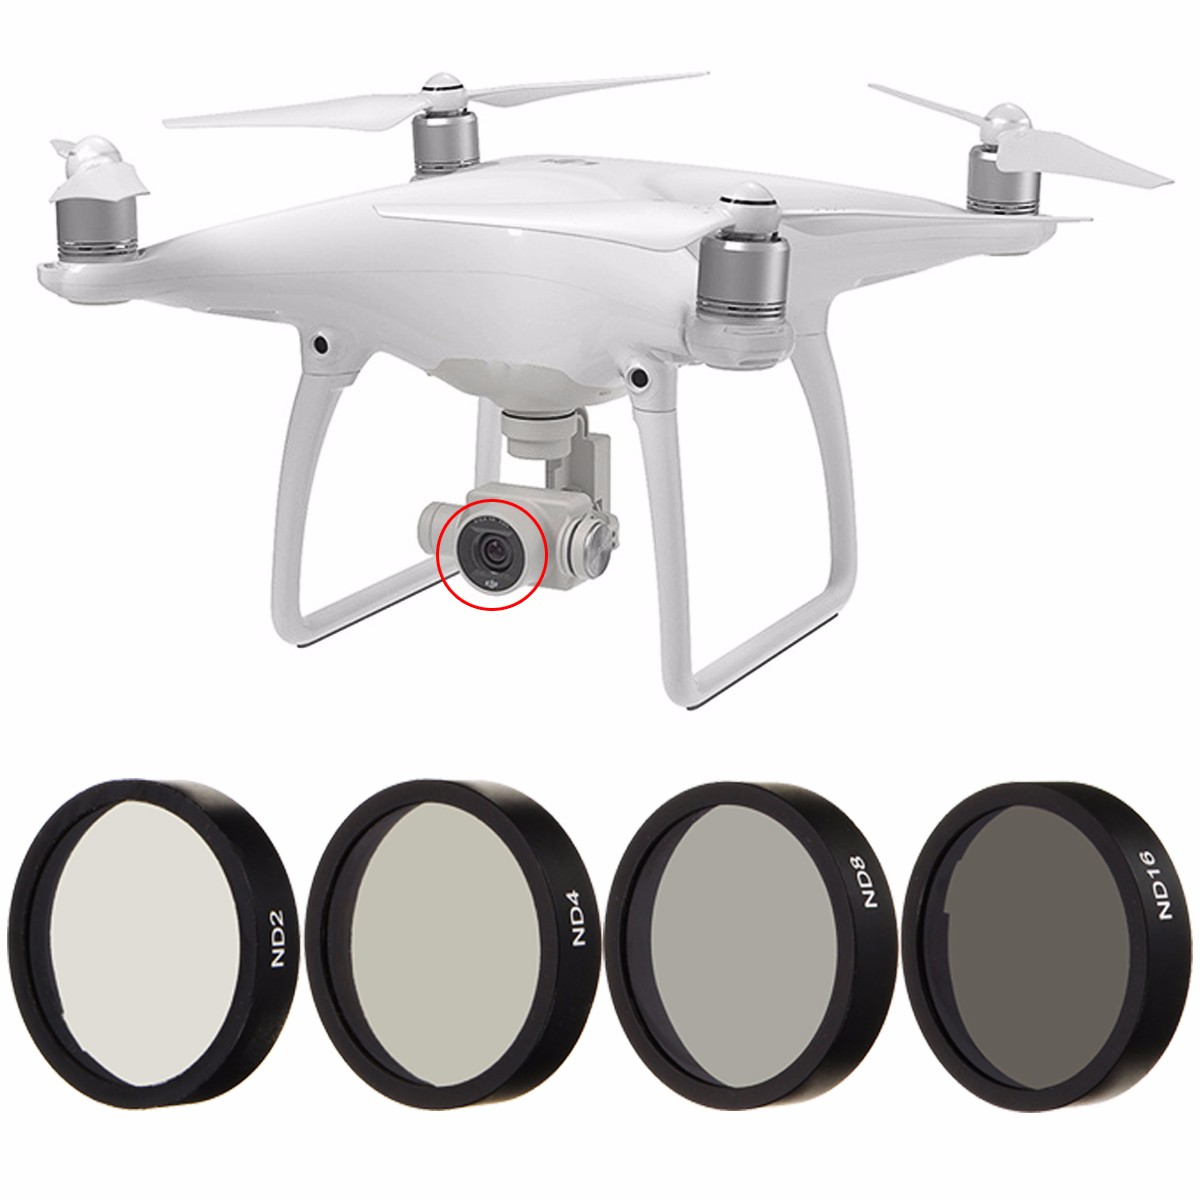 ND2/ND4/ND8/ND16 Lens Filter for DJI Phantom